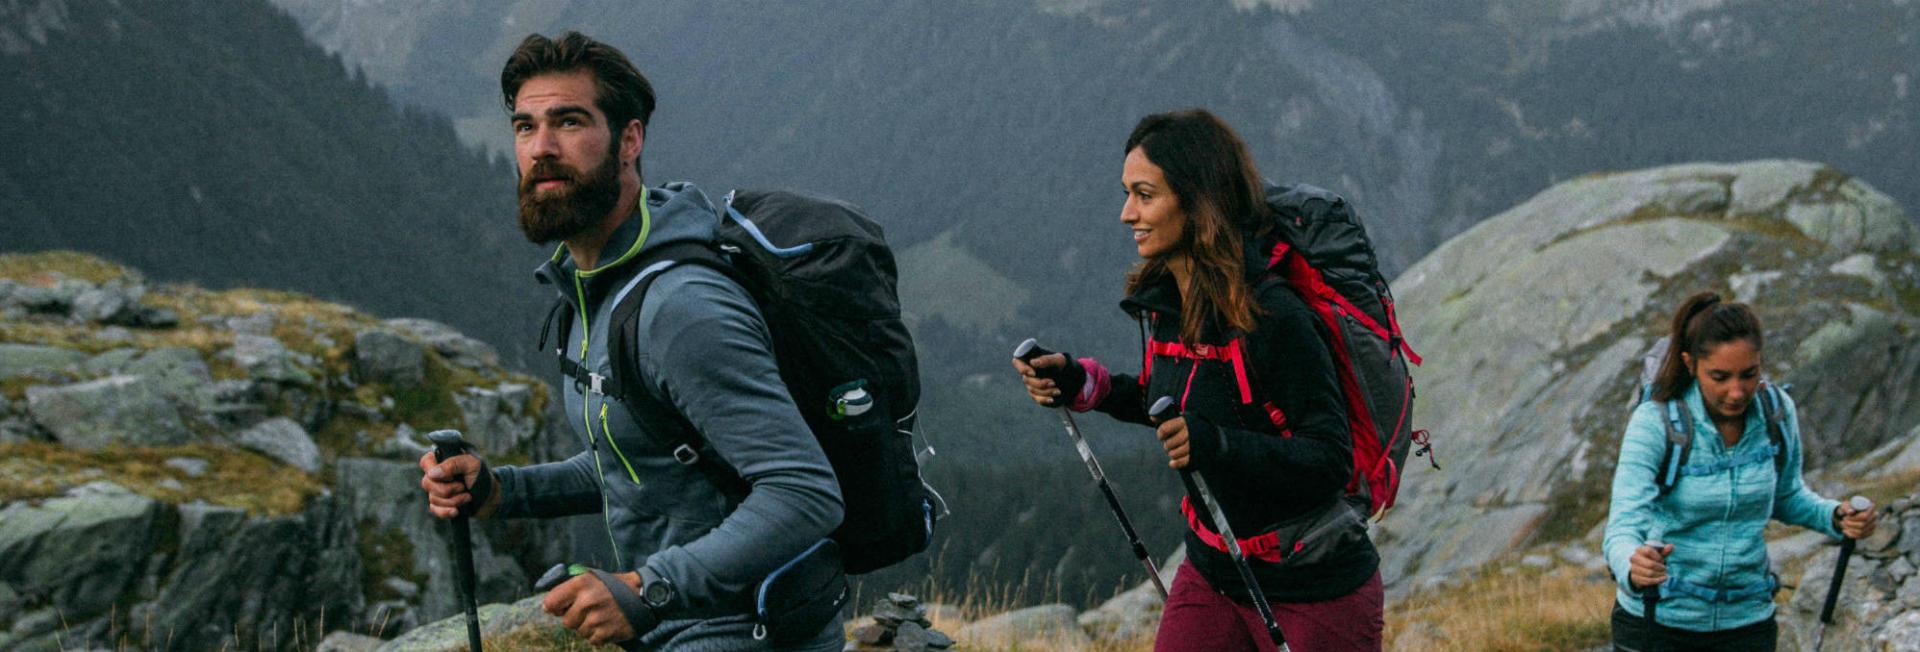 Ready To Set Off On A Hike?